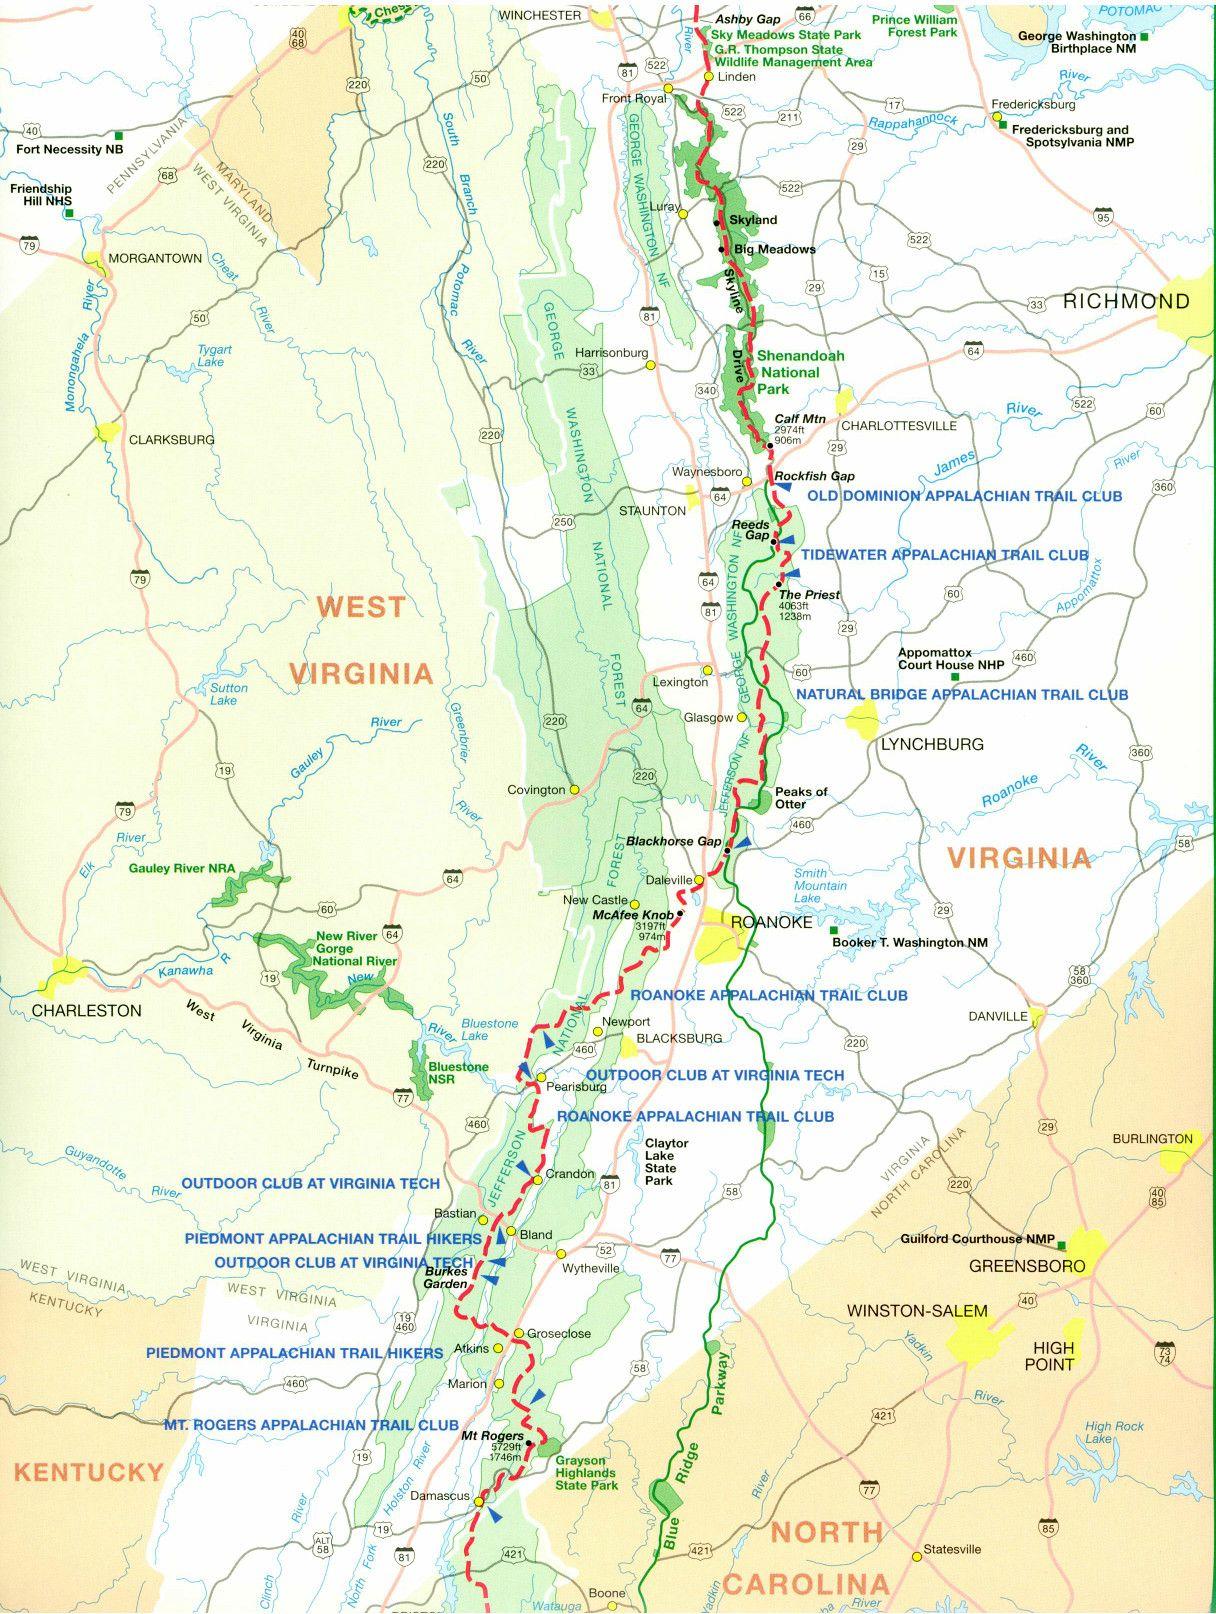 Pin on Appalachian Trail: 2